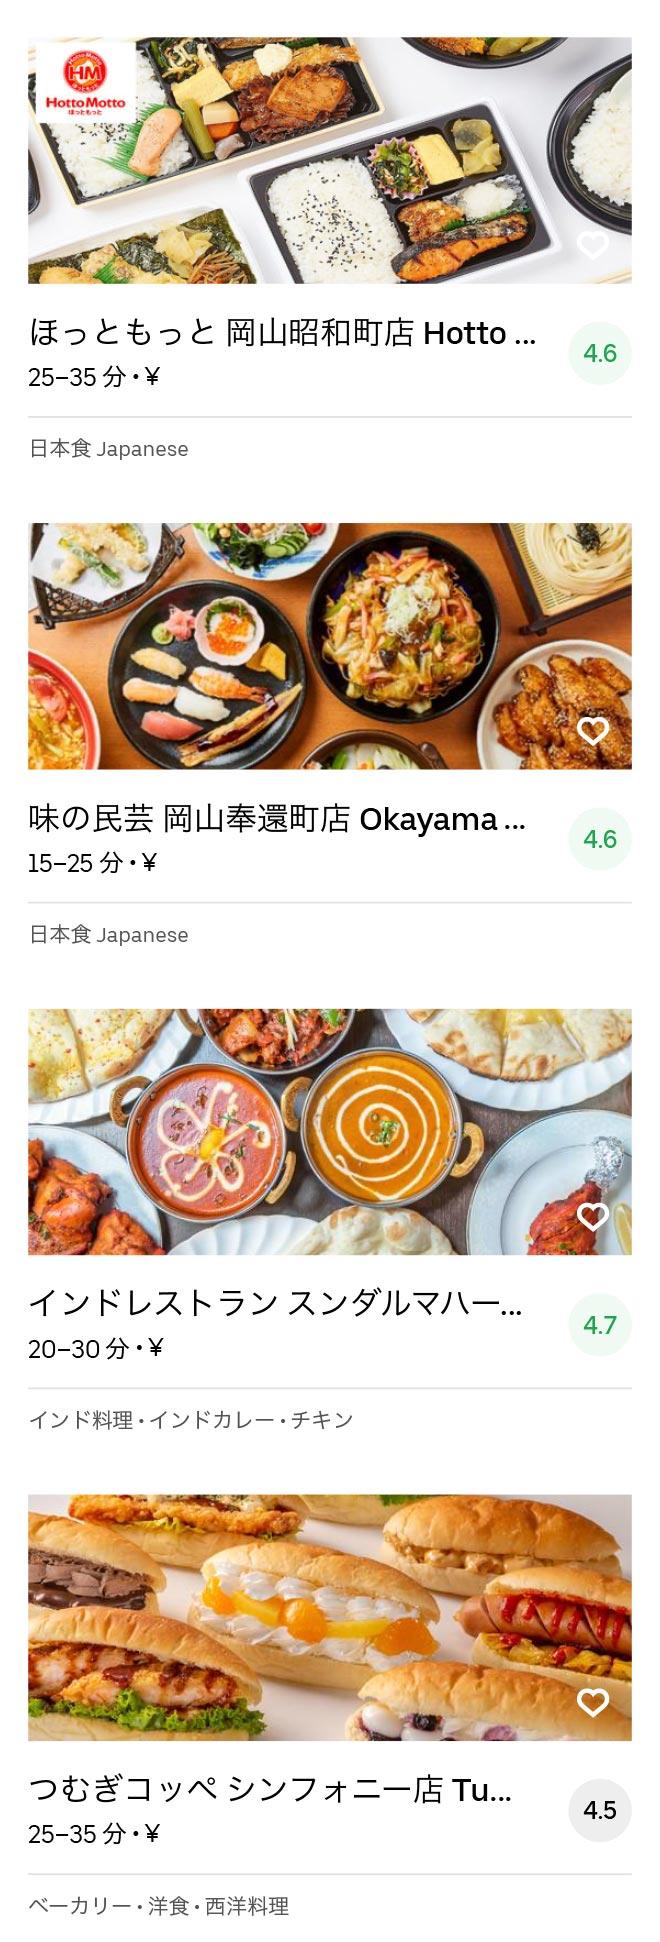 Okayama menu 2007 03